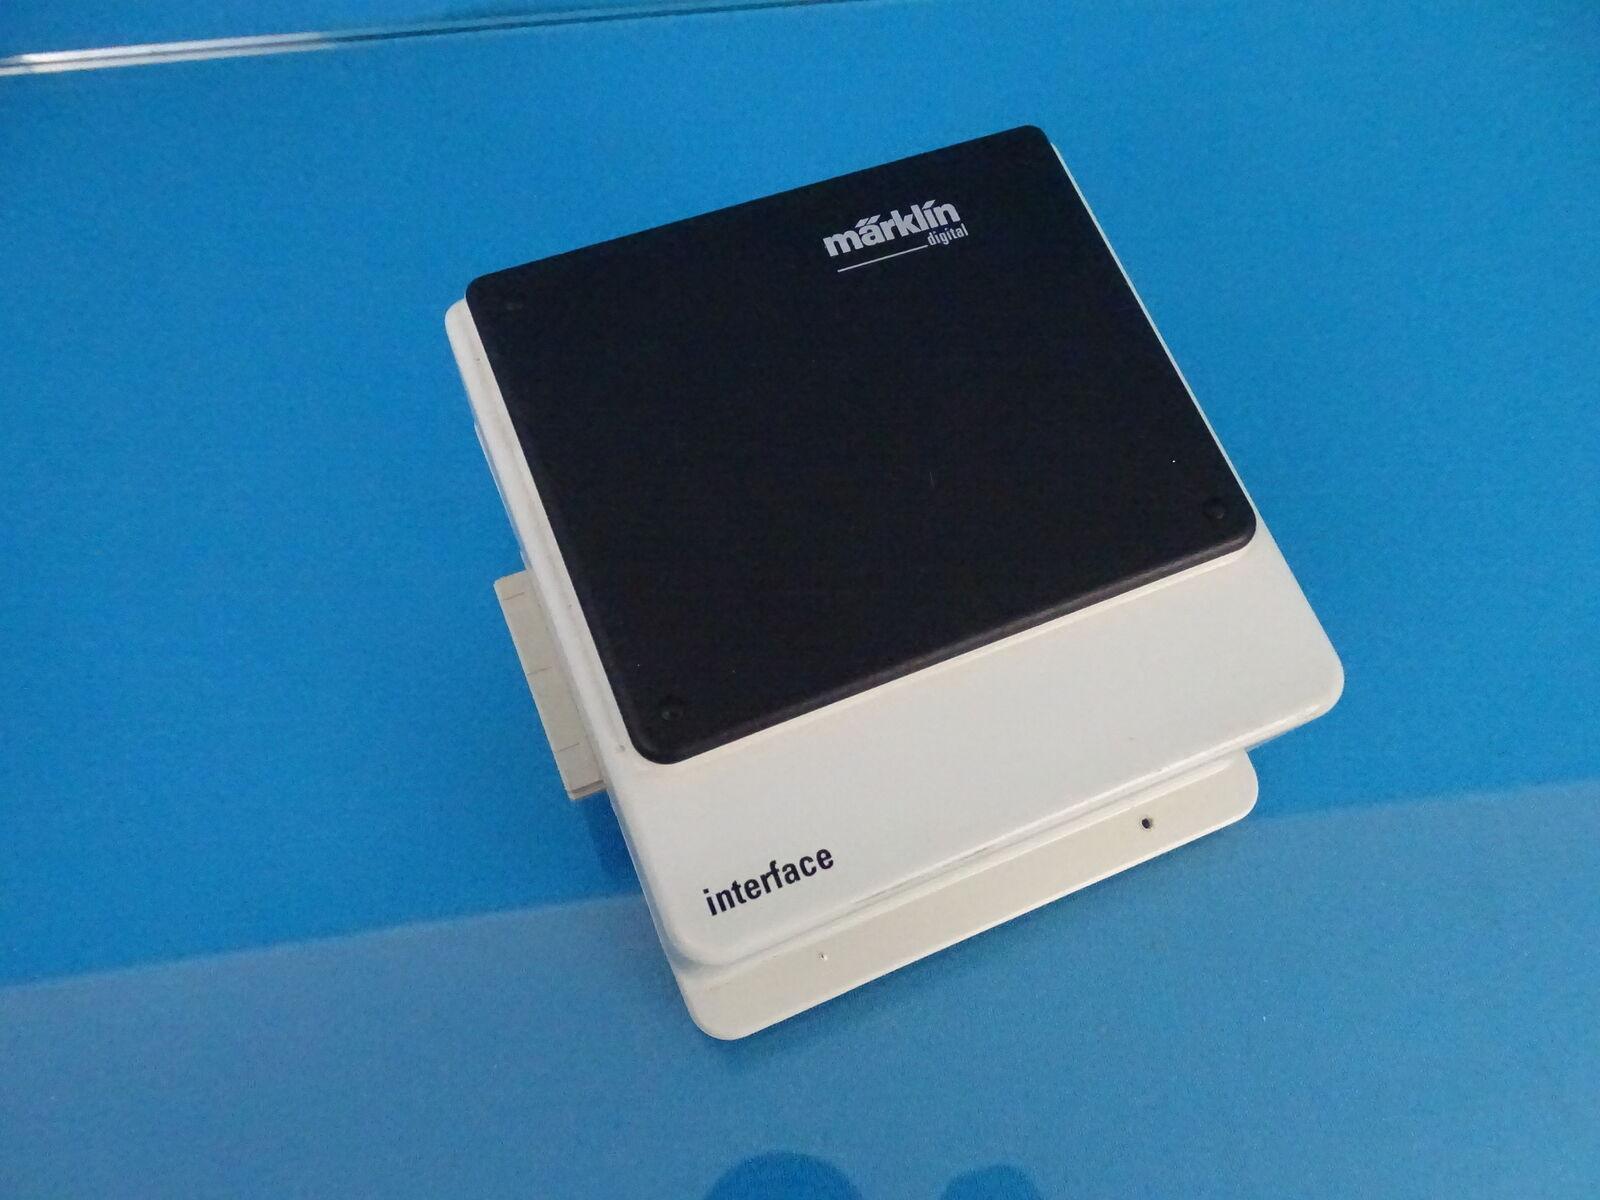 Marklin 6051 Interface Digital OVP